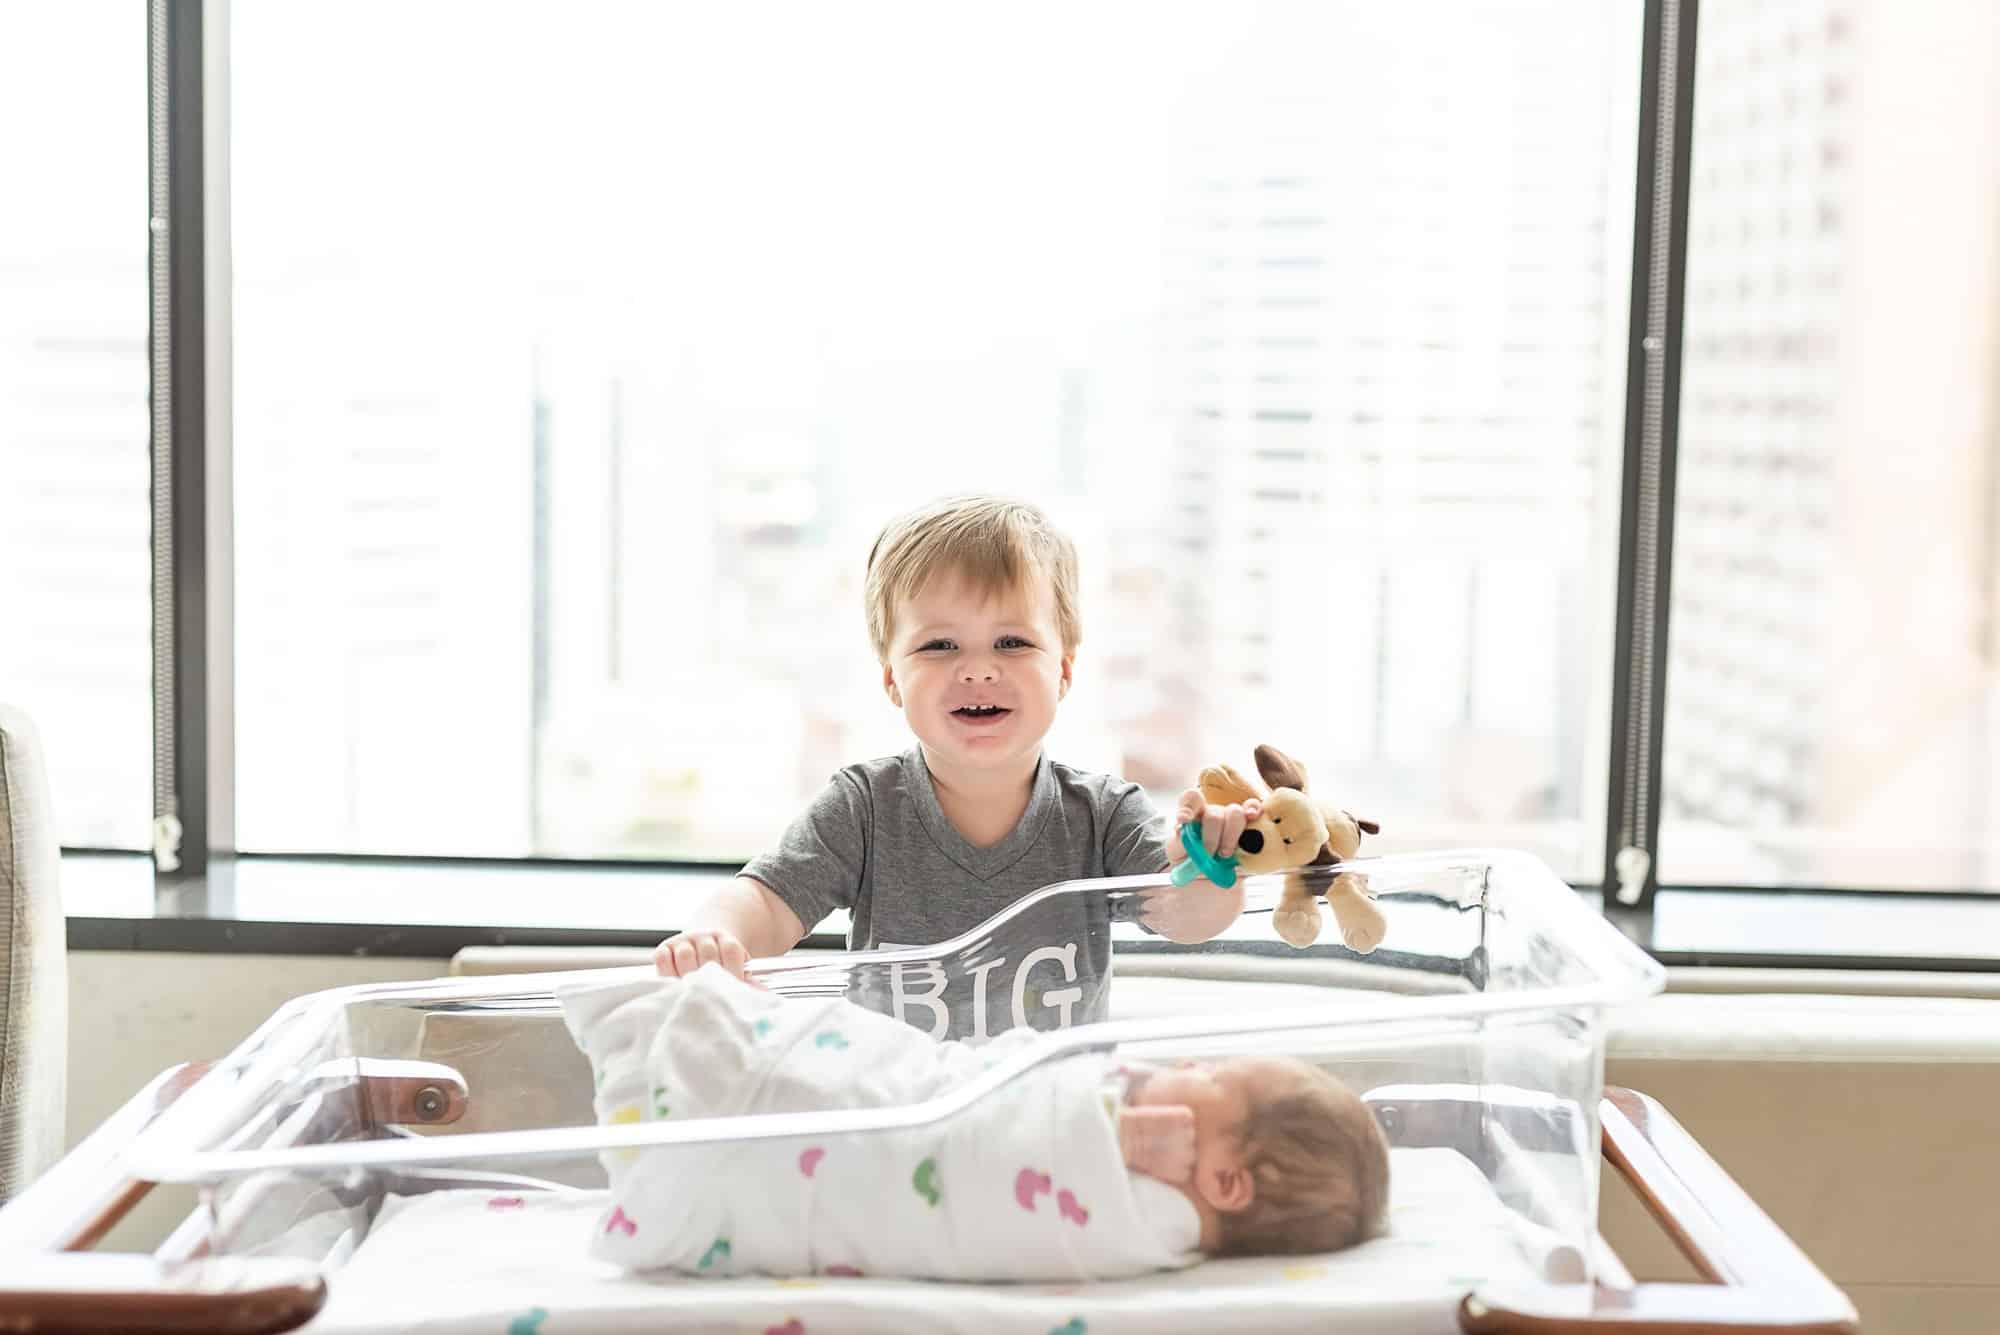 Big brother meeting newborn sibling